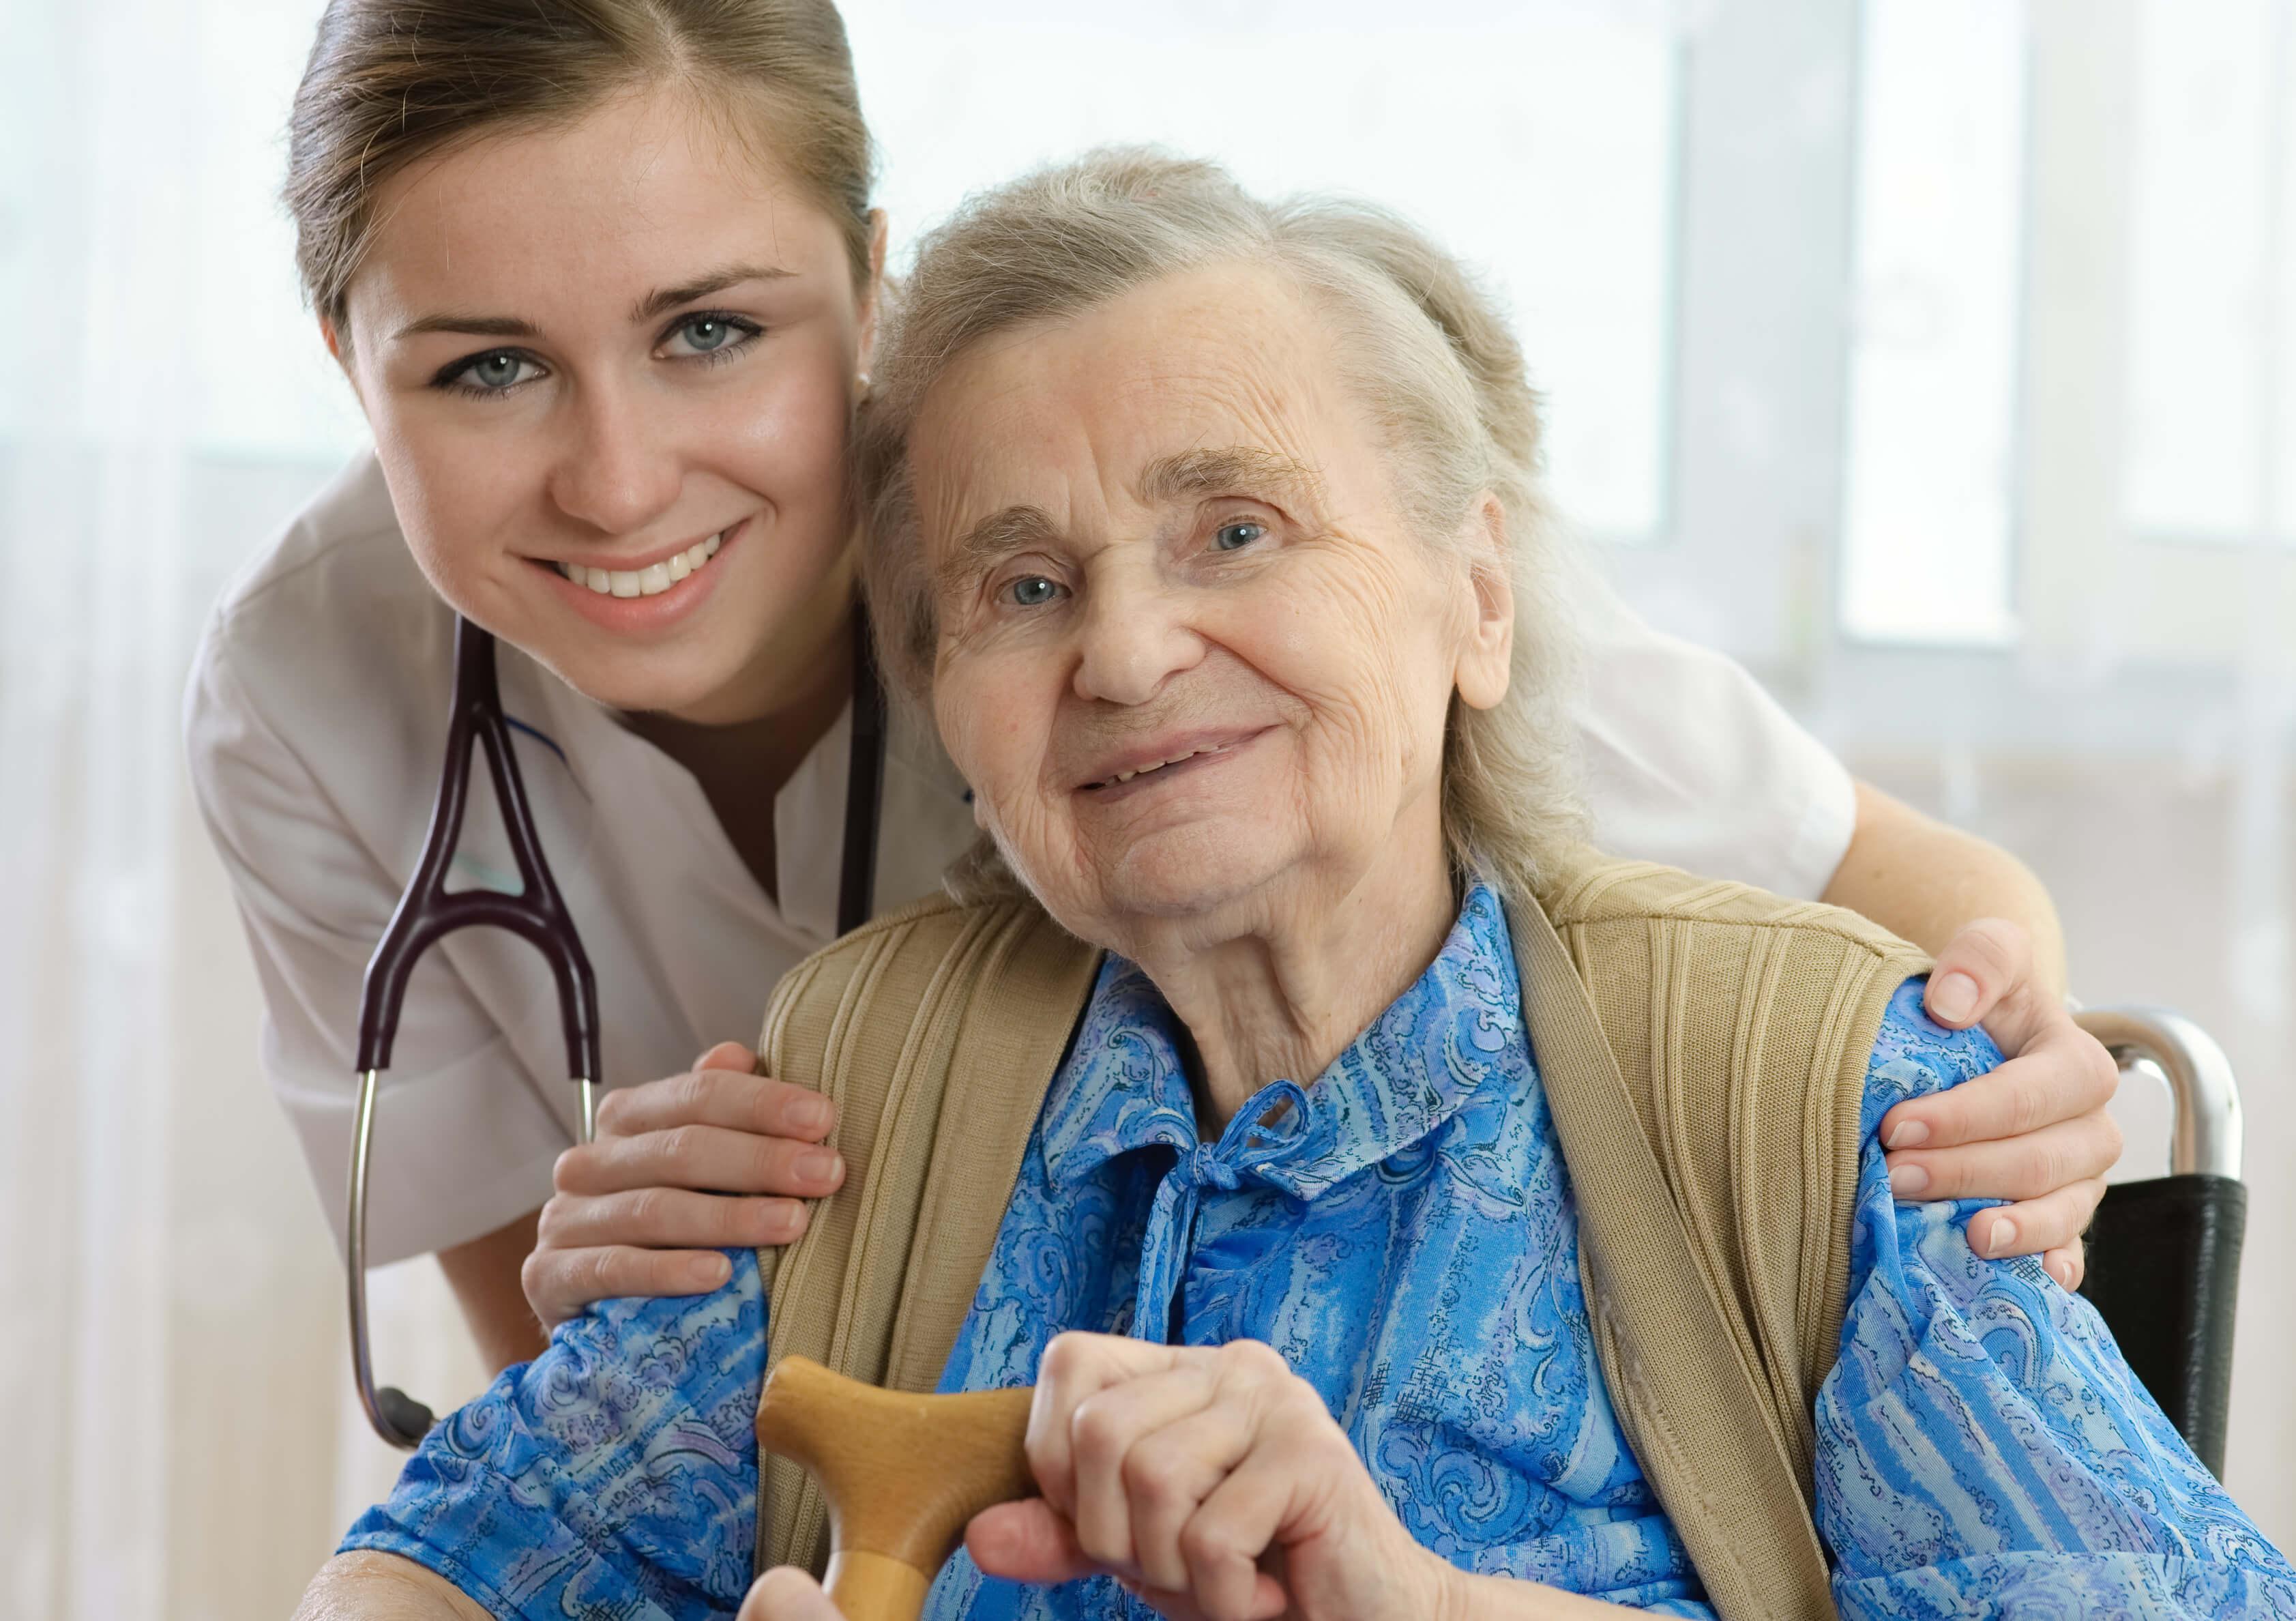 Curso para cuidador de idosos